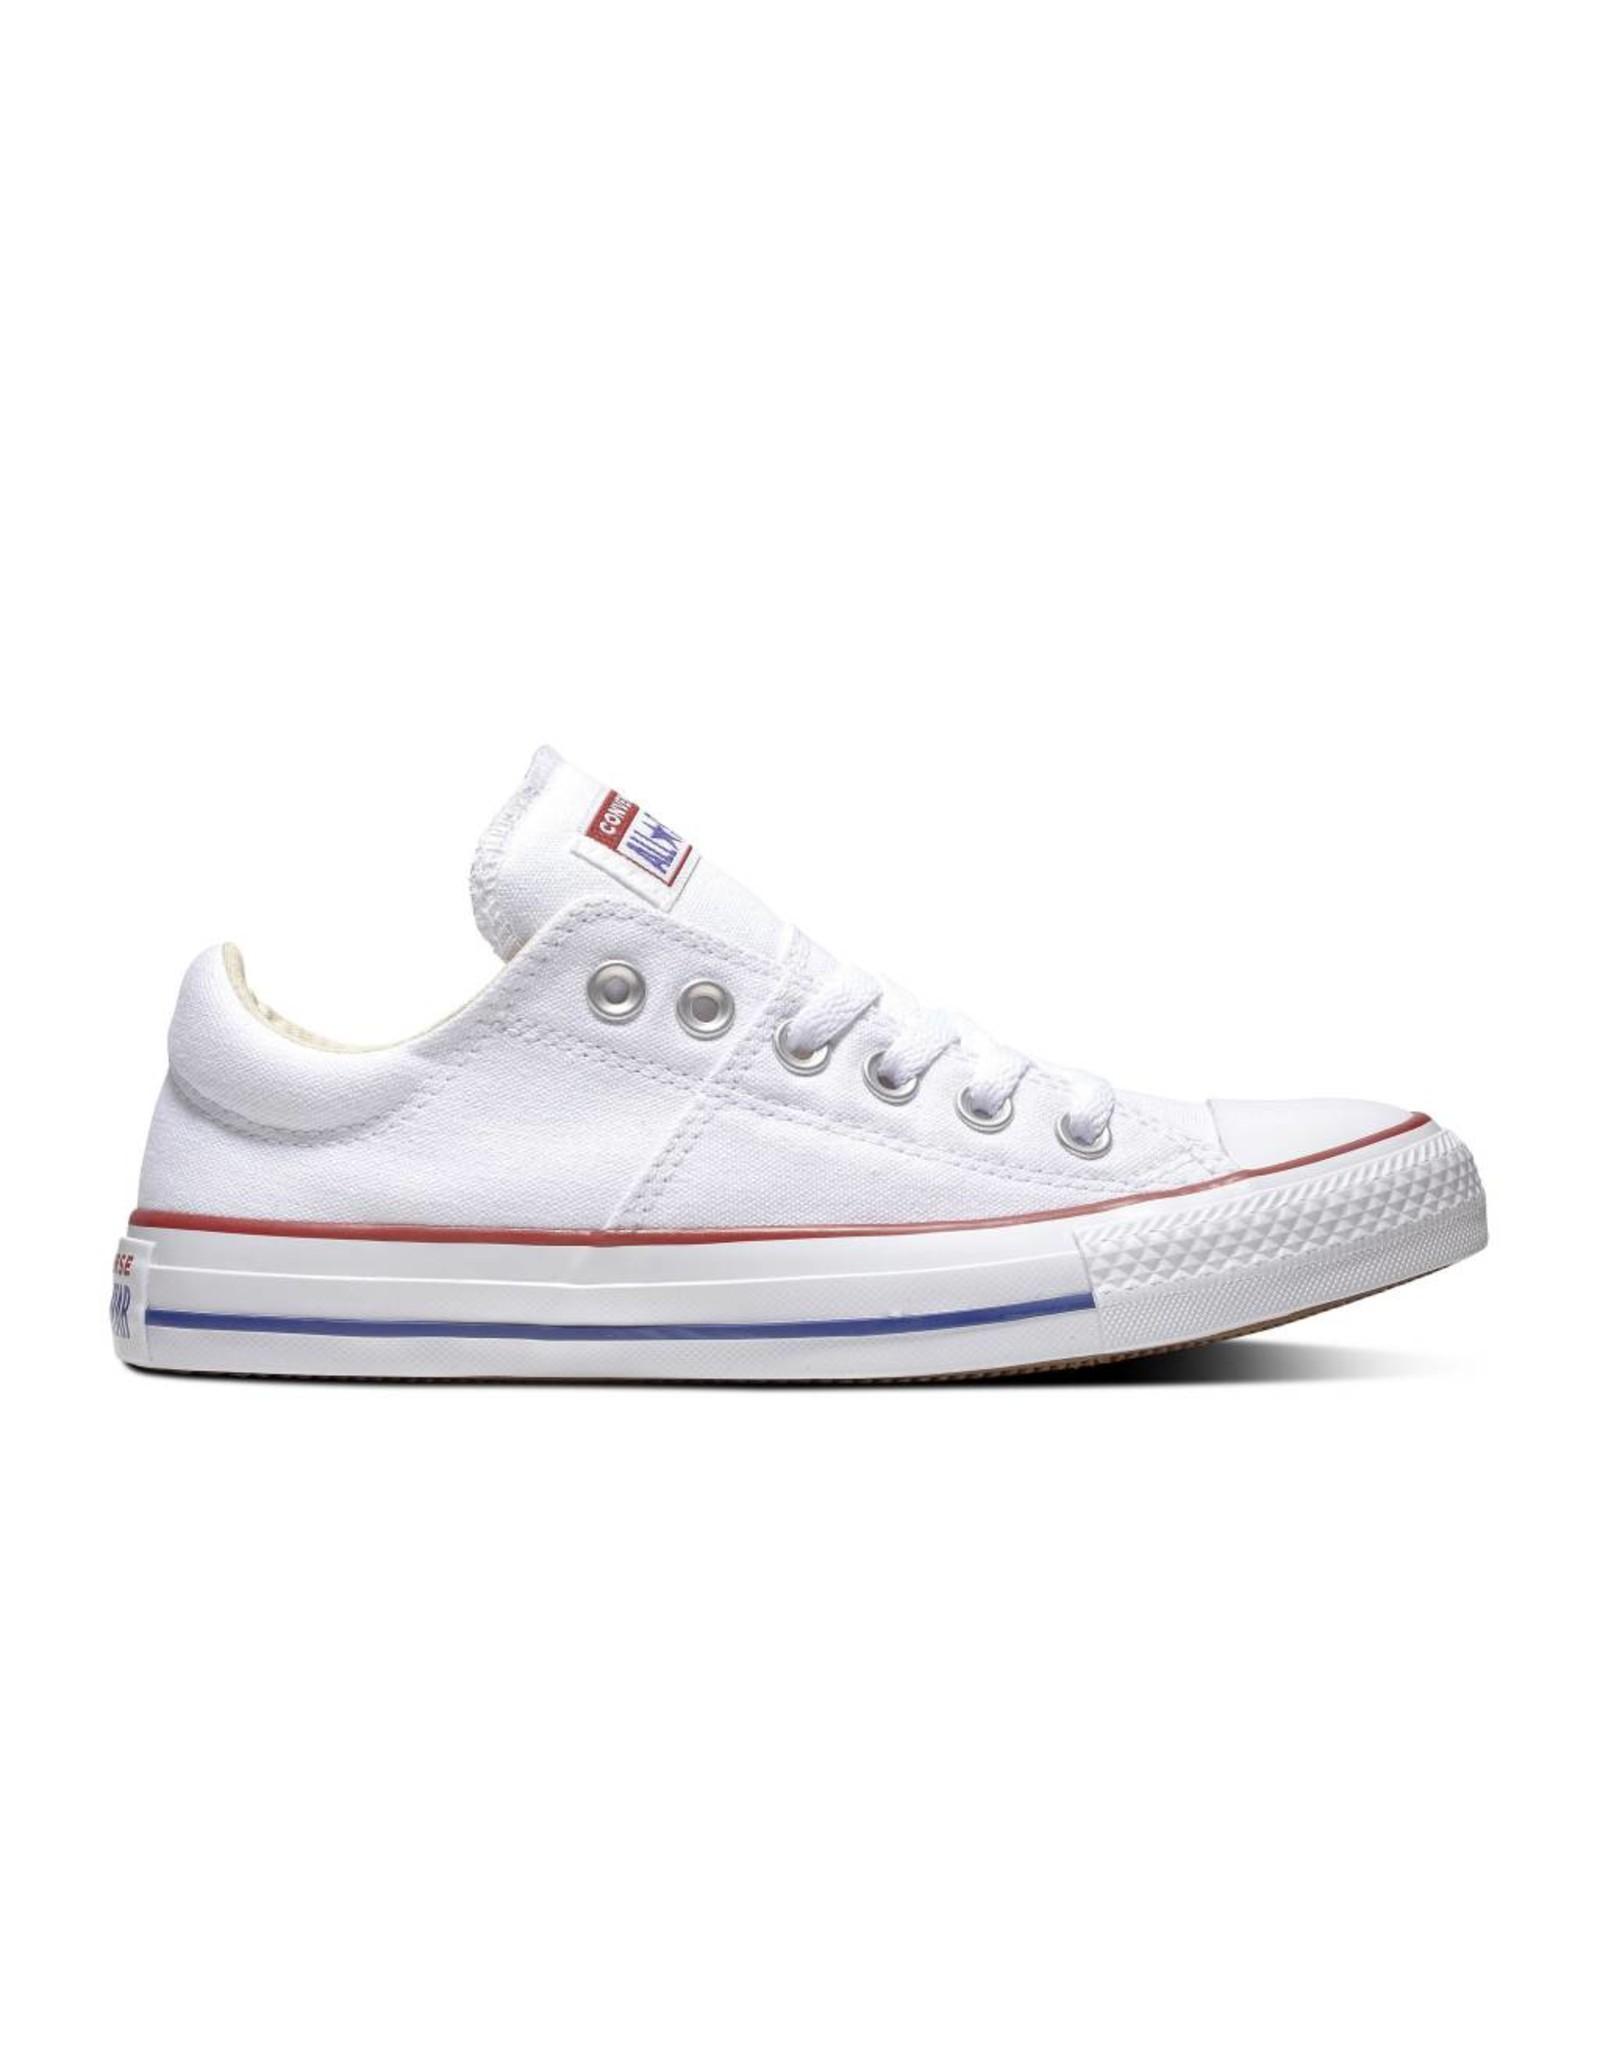 CONVERSE CHUCK TAYLOR ALL STAR MADISON OX WHITE/WHITE/WHITE C13MW-563509C